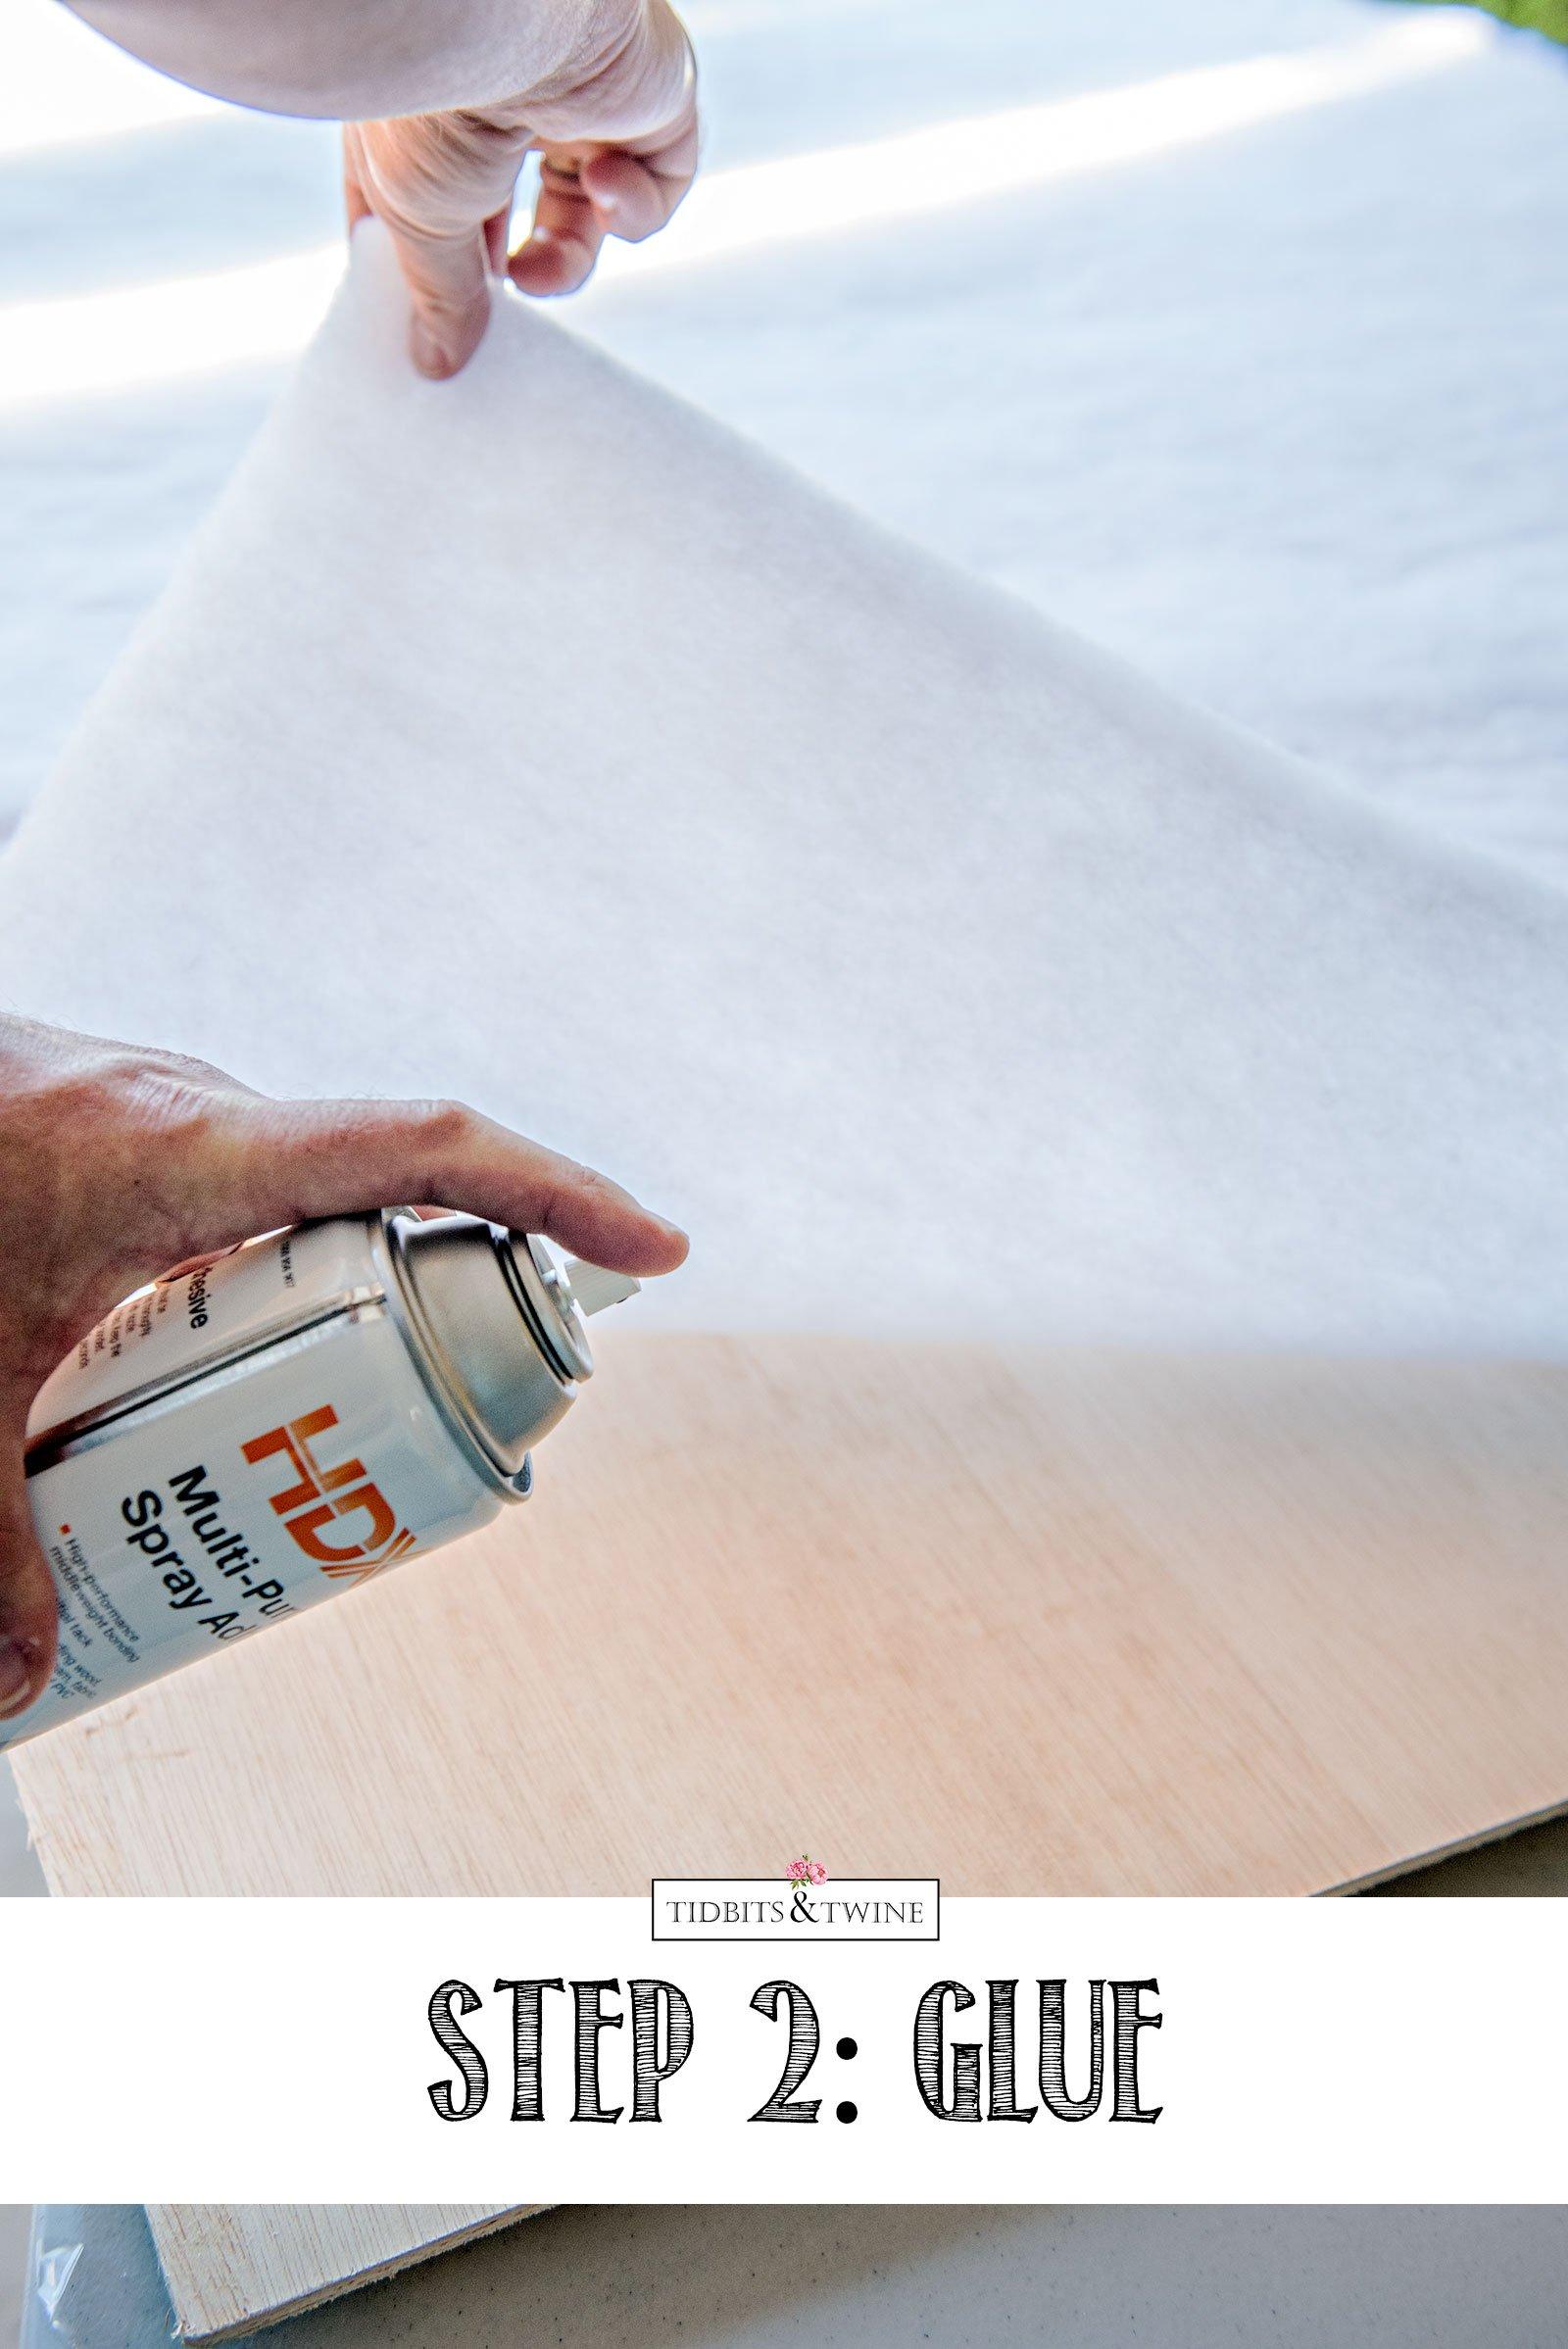 DIY Ribbon Memo Board - Spray Adhesive to Attach Batting to Board